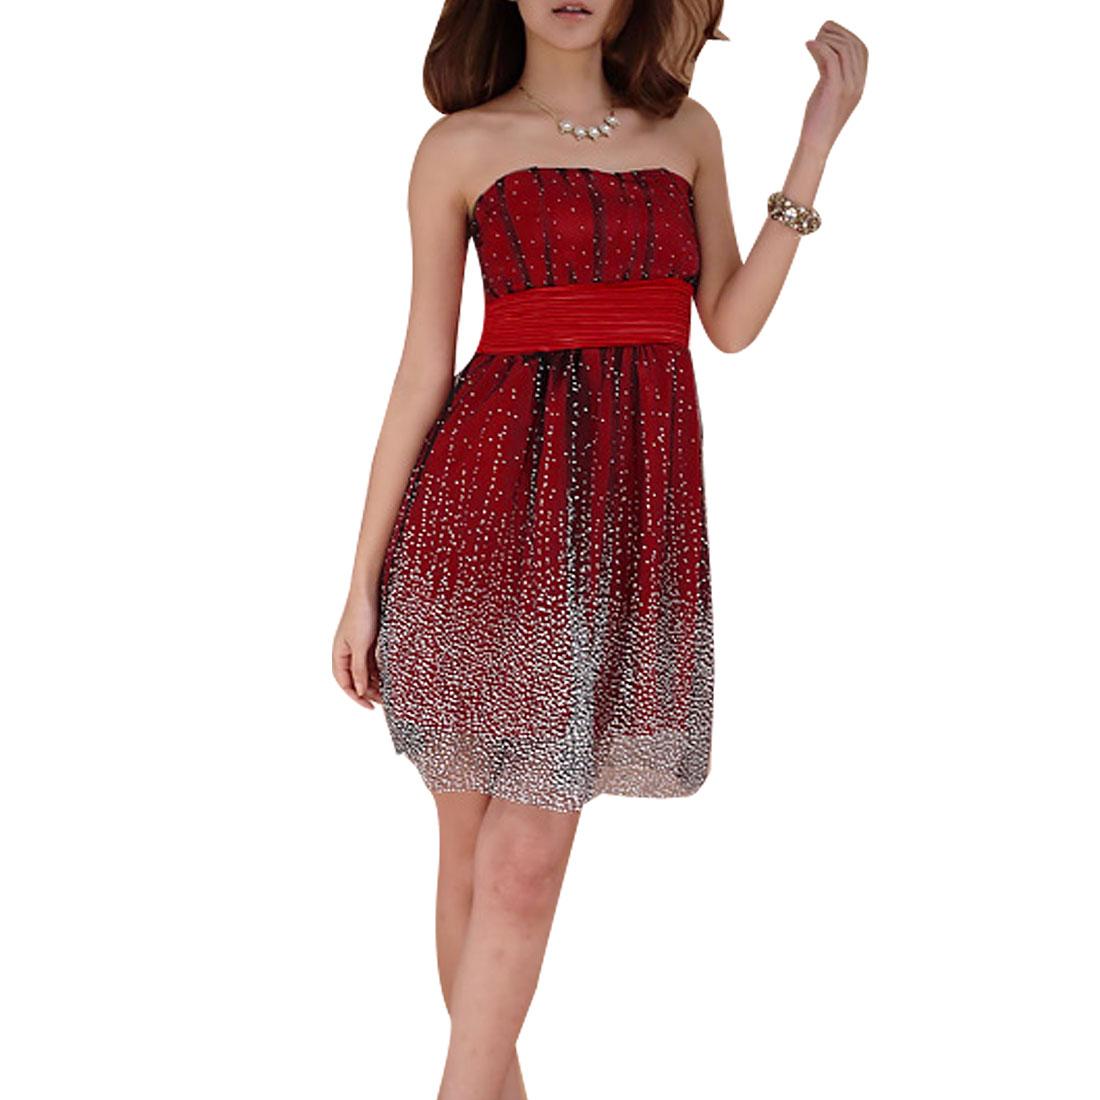 Women Sleeveless White Dots Red Black Ruffled Tube Above Knee Dress XS